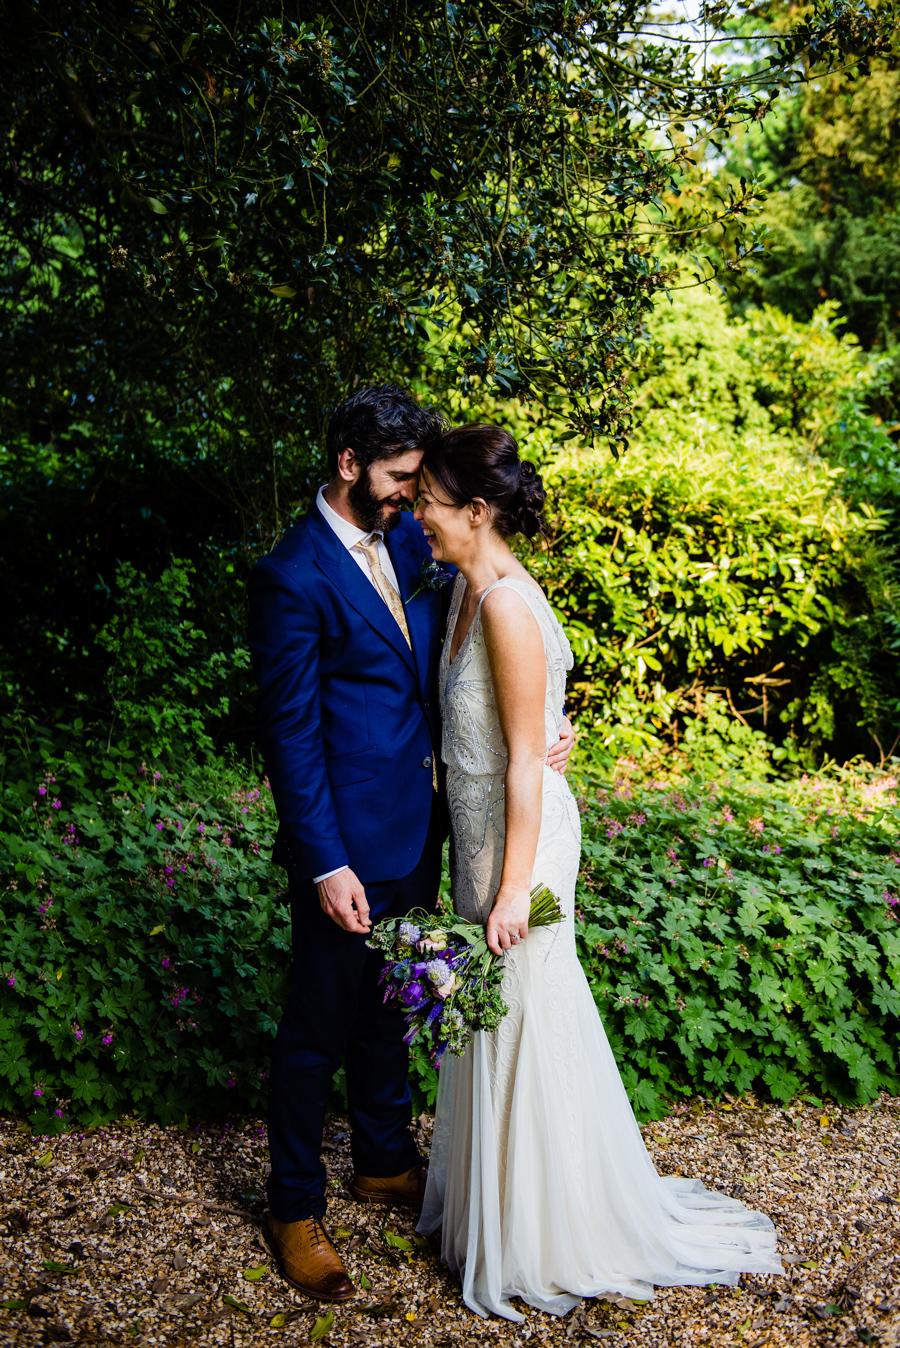 Nikki & Gareth's gloriously happy Pennard House wedding with Jonny Barratt Photography (41)